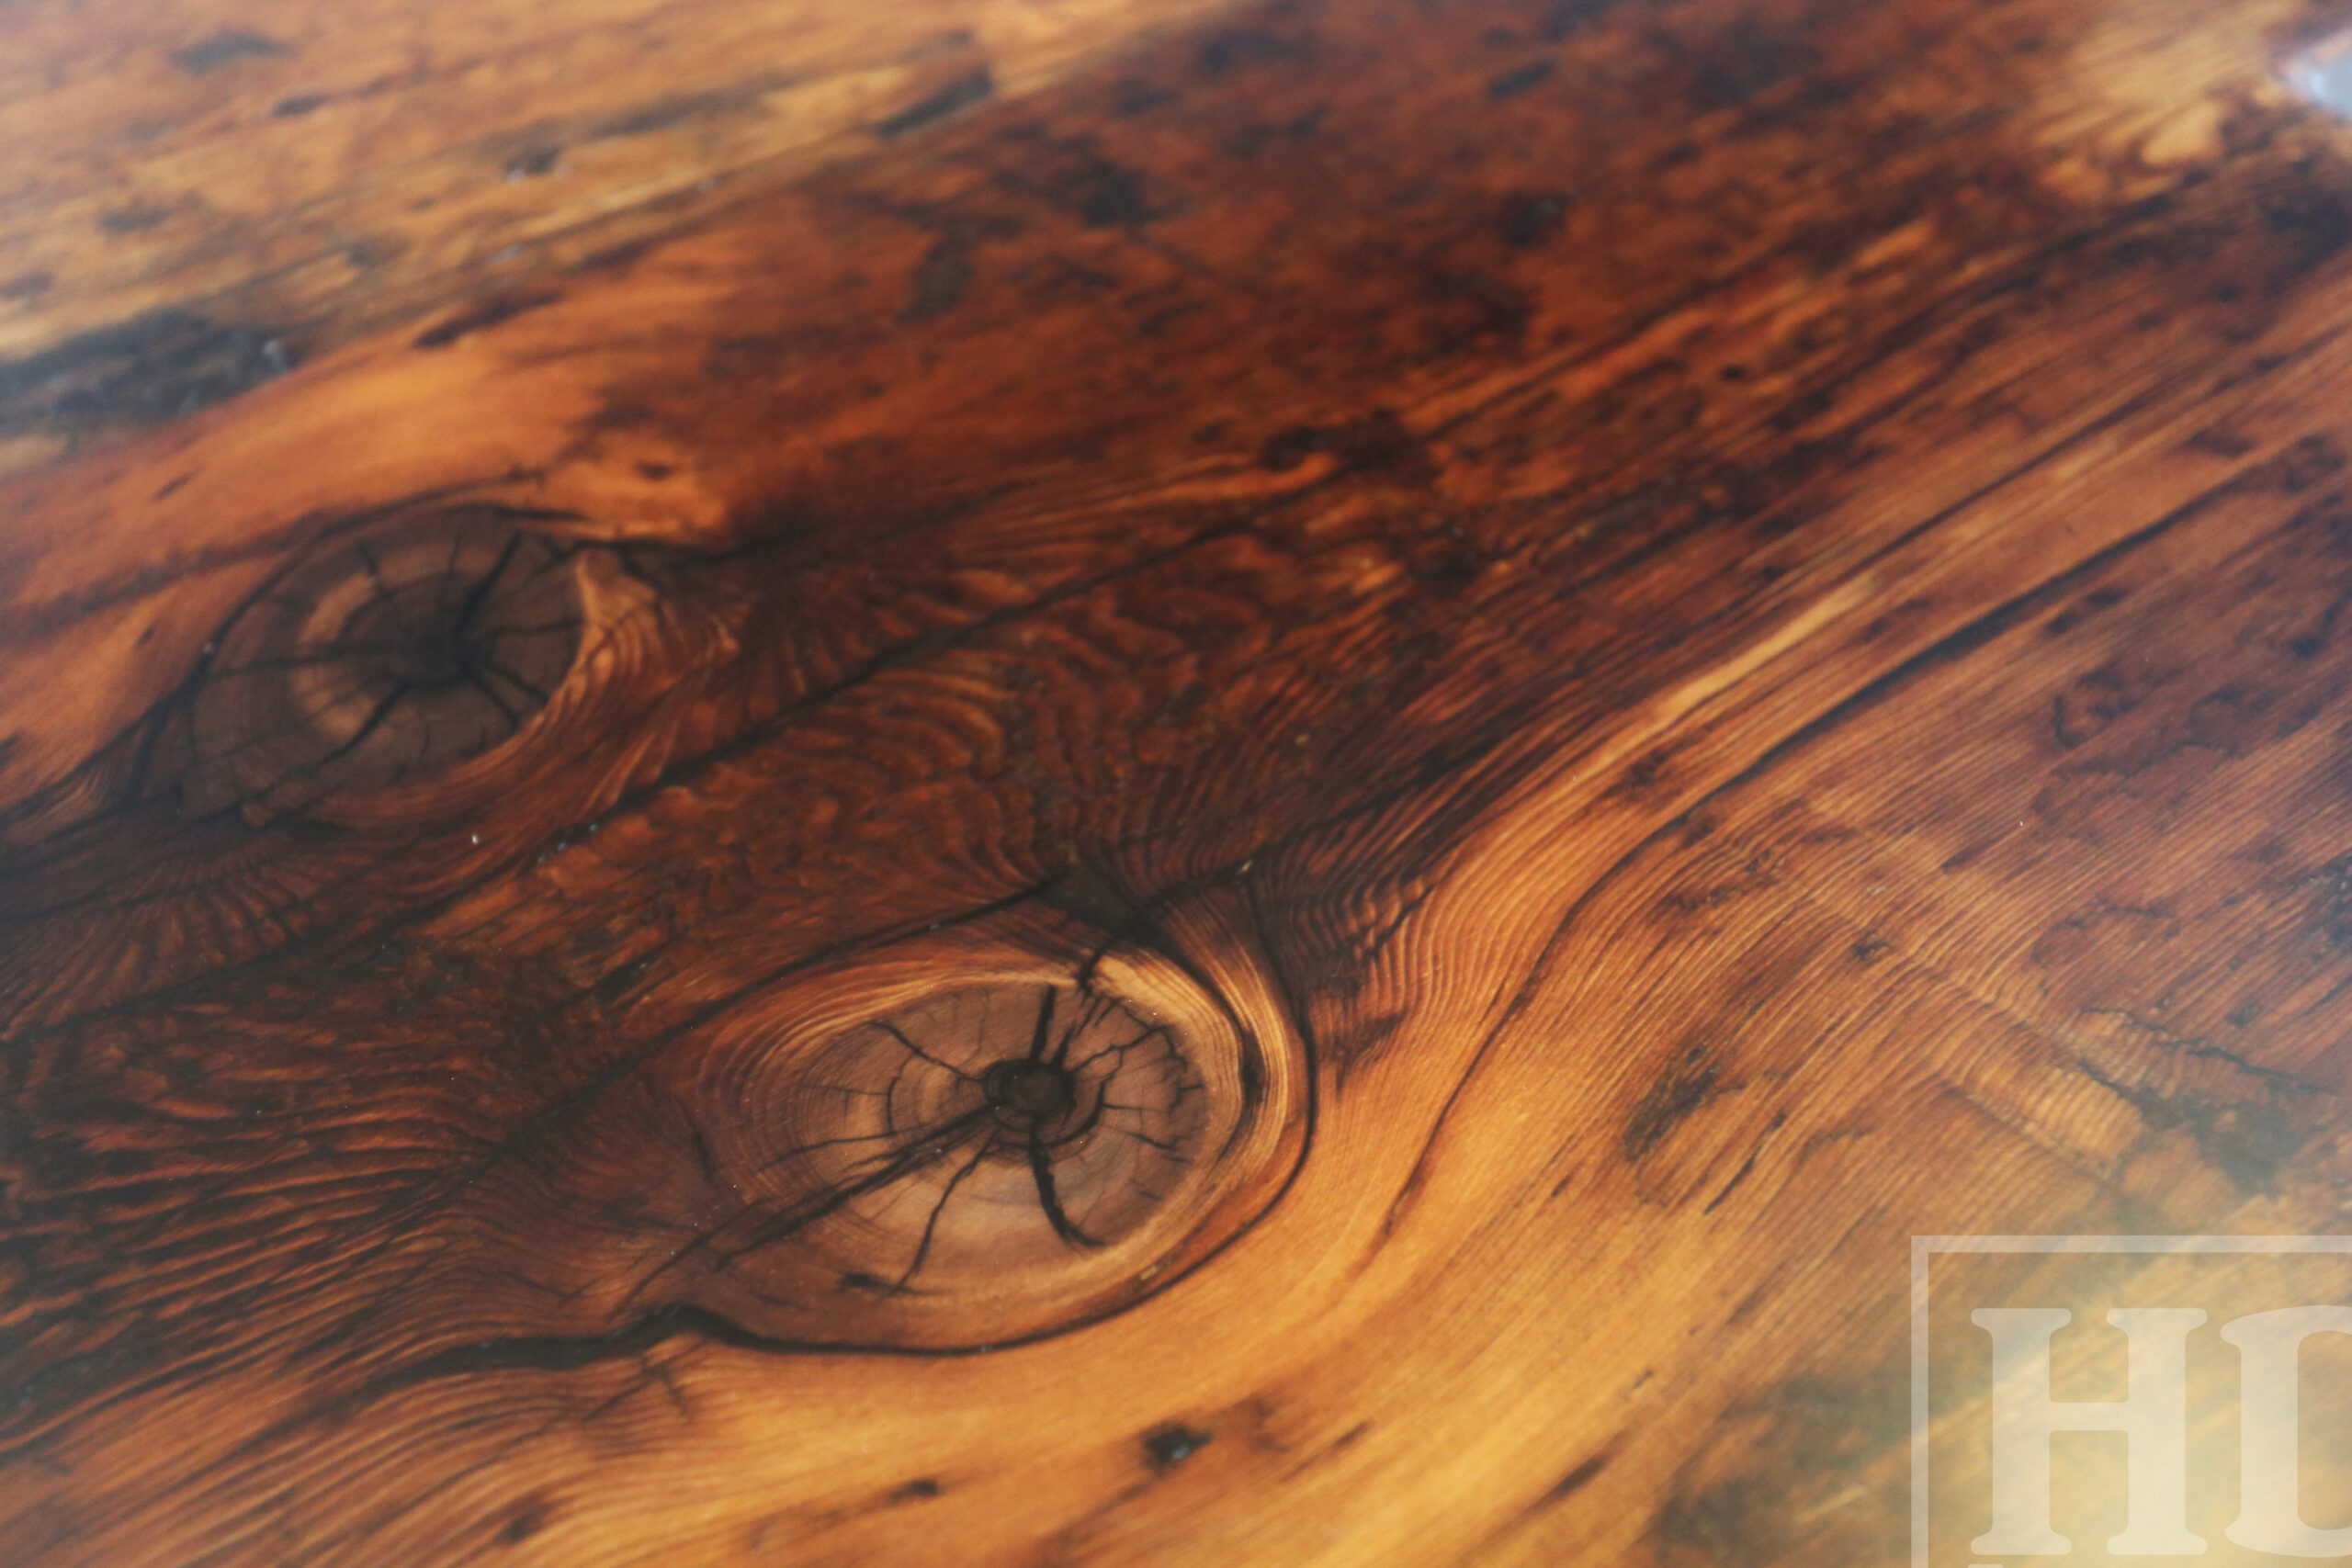 "Custom Reclaimed Wood Island Top - 2"" Hemlock Threshing Floor Construction - Original Ontario barnwood edges & distressing maintained - Premium epoxy + satin polyurethane finish - www.table.ca"